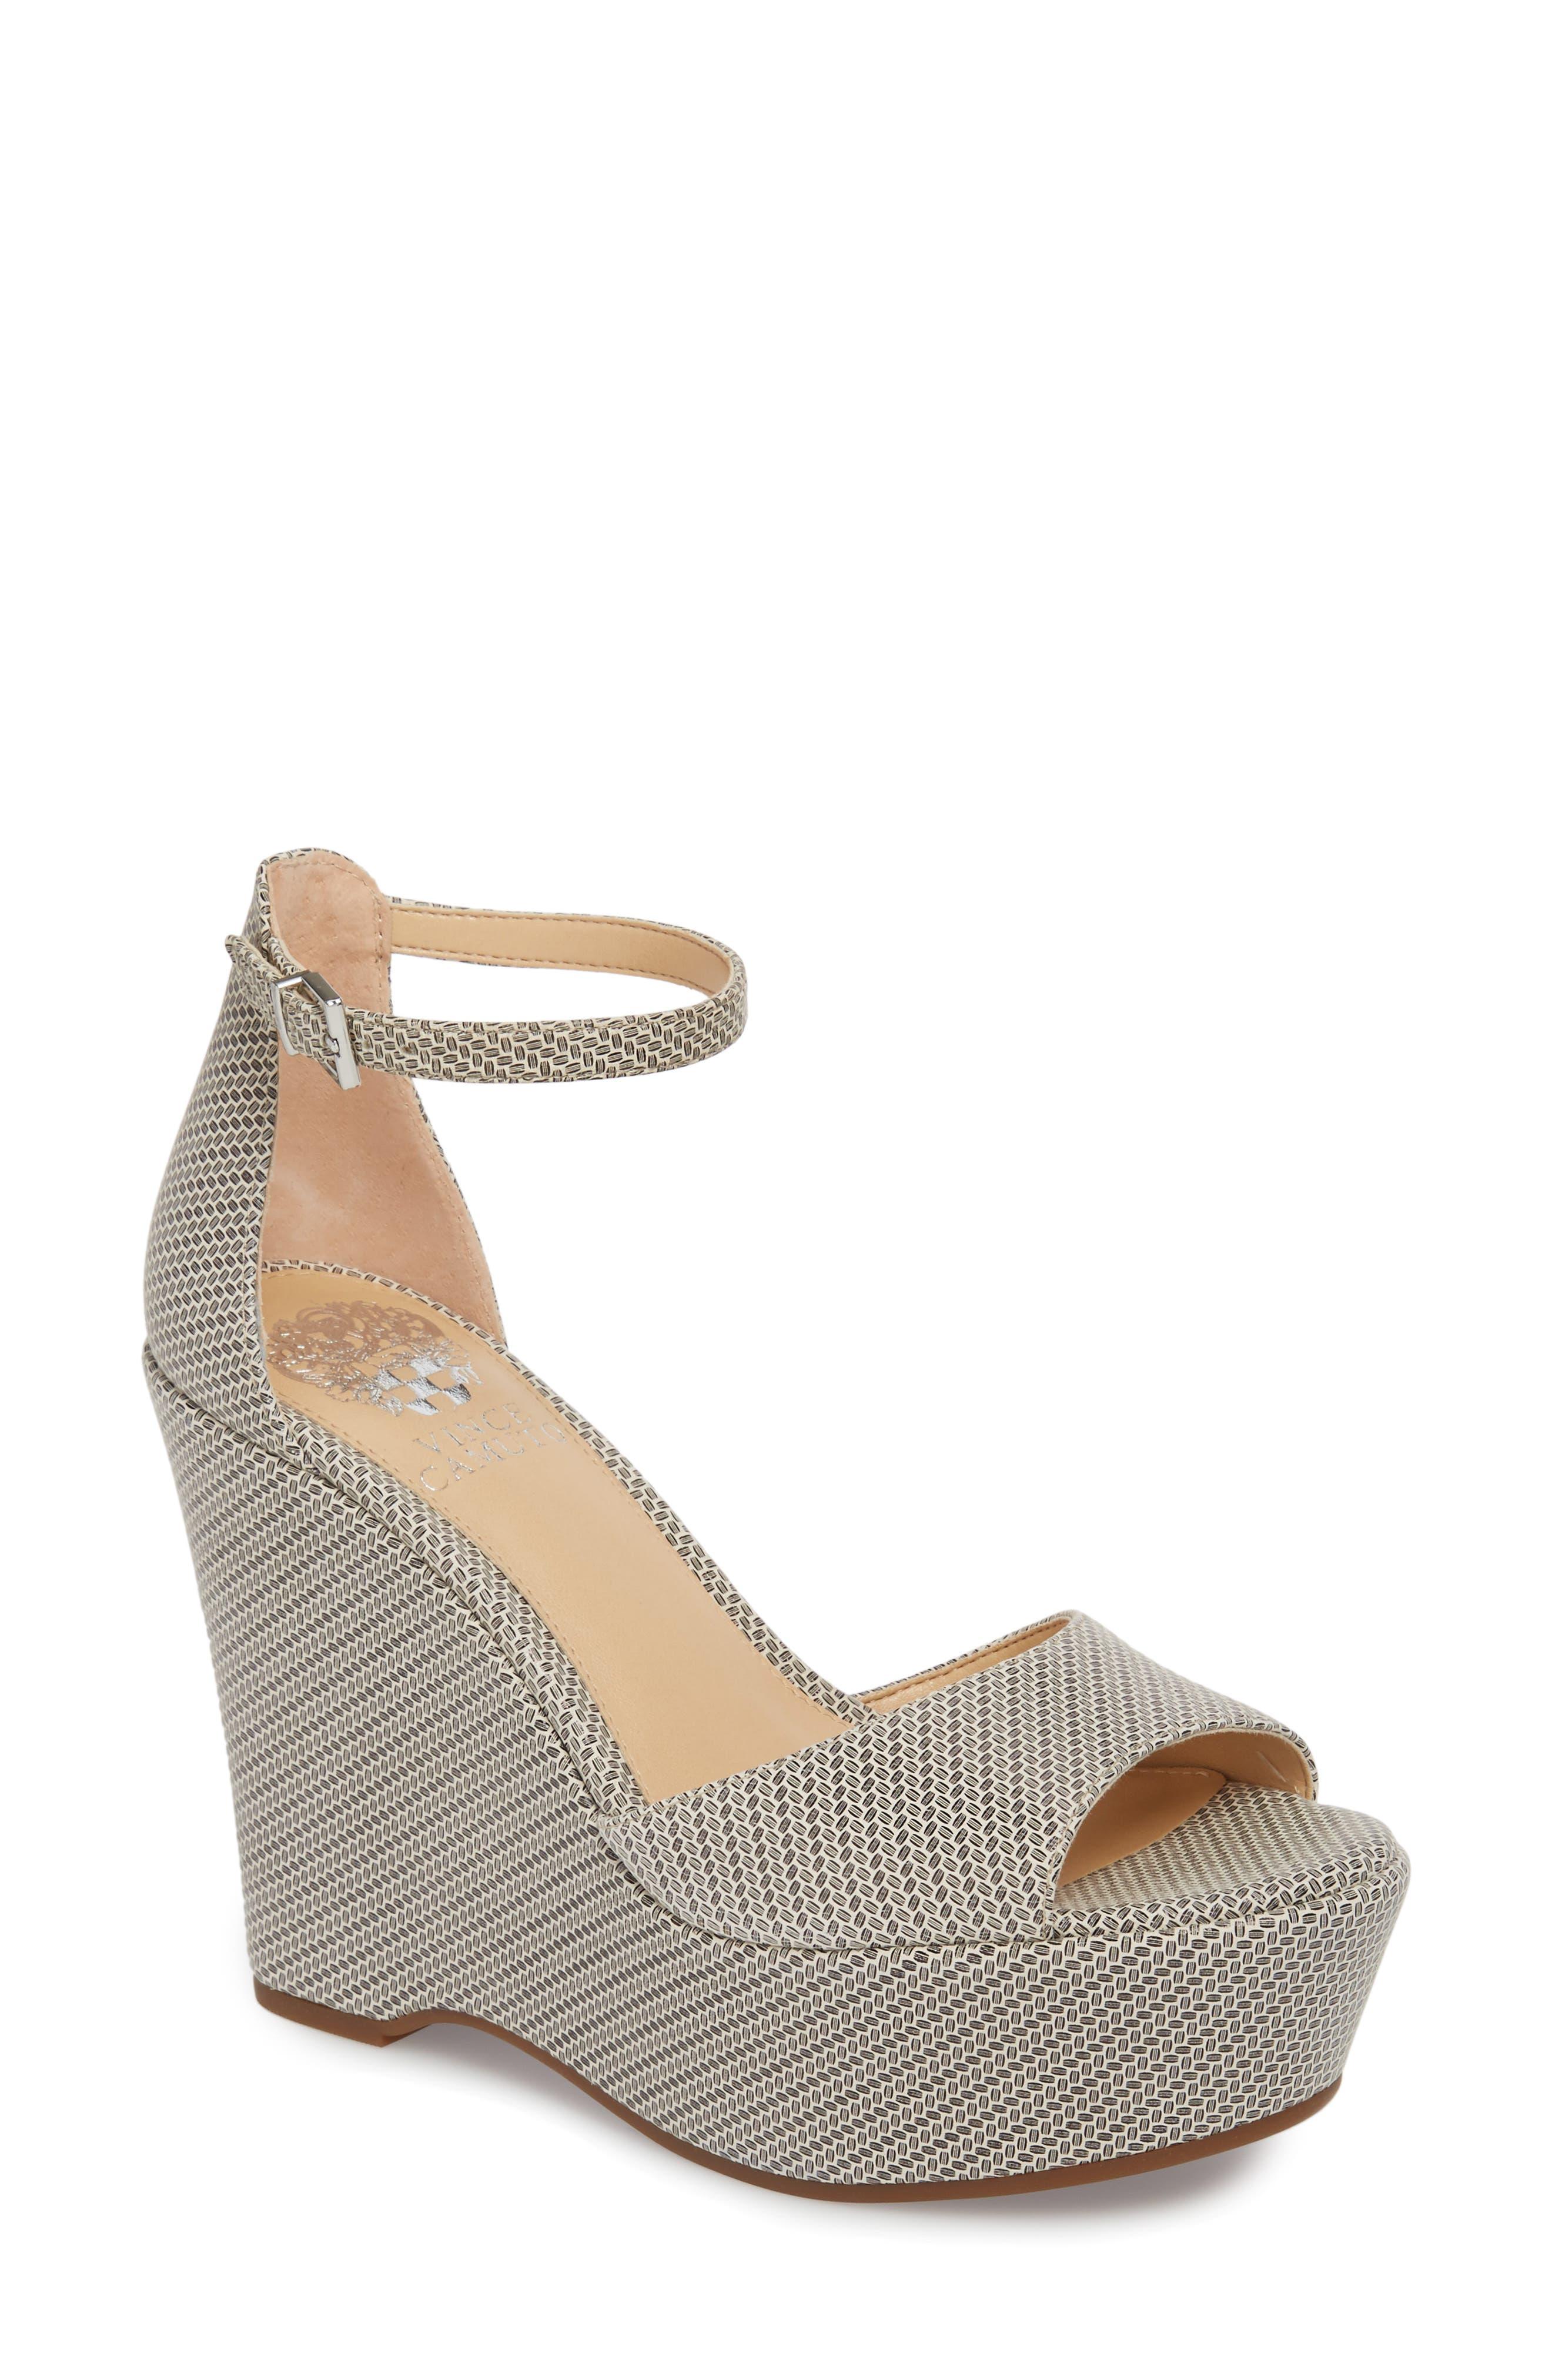 Tatchen Ankle Strap Platform Sandal,                         Main,                         color, 002